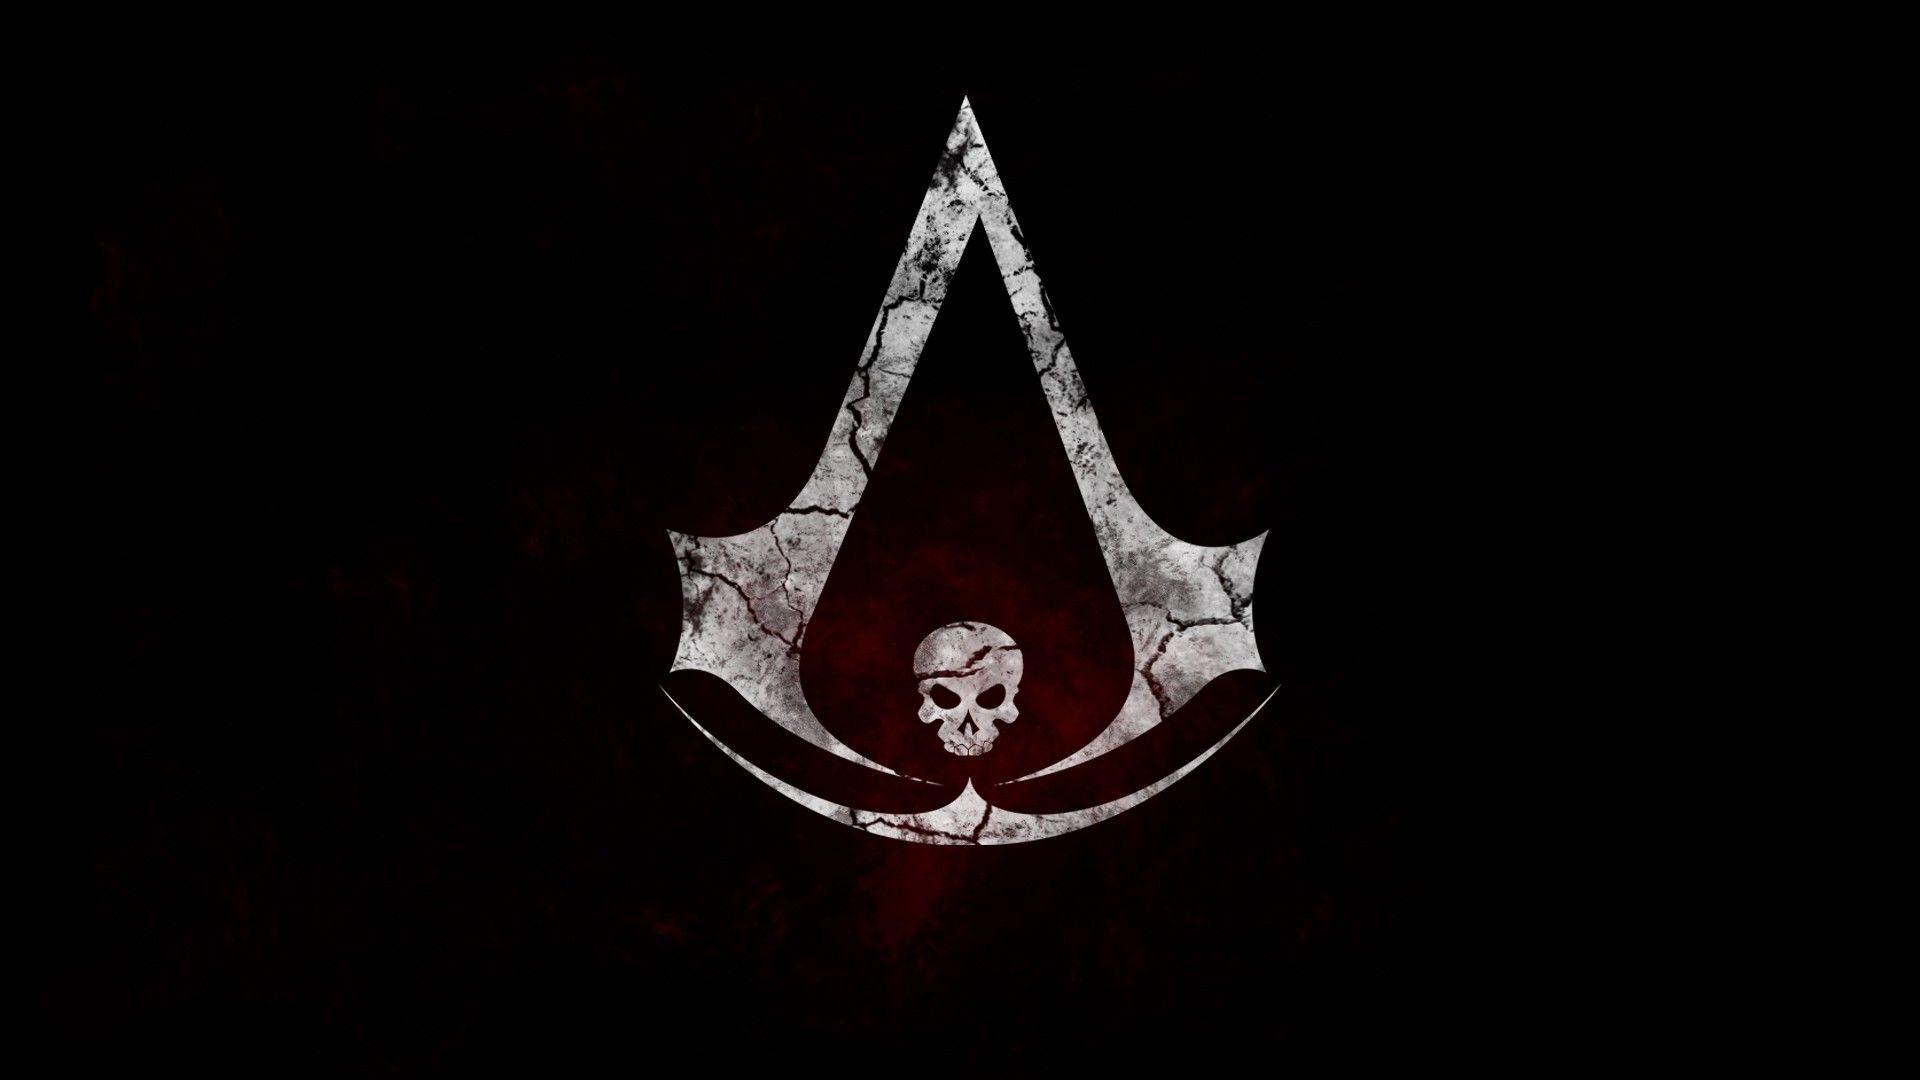 48 Assassin S Creed Black Flag Wallpapers On Wallpapersafari